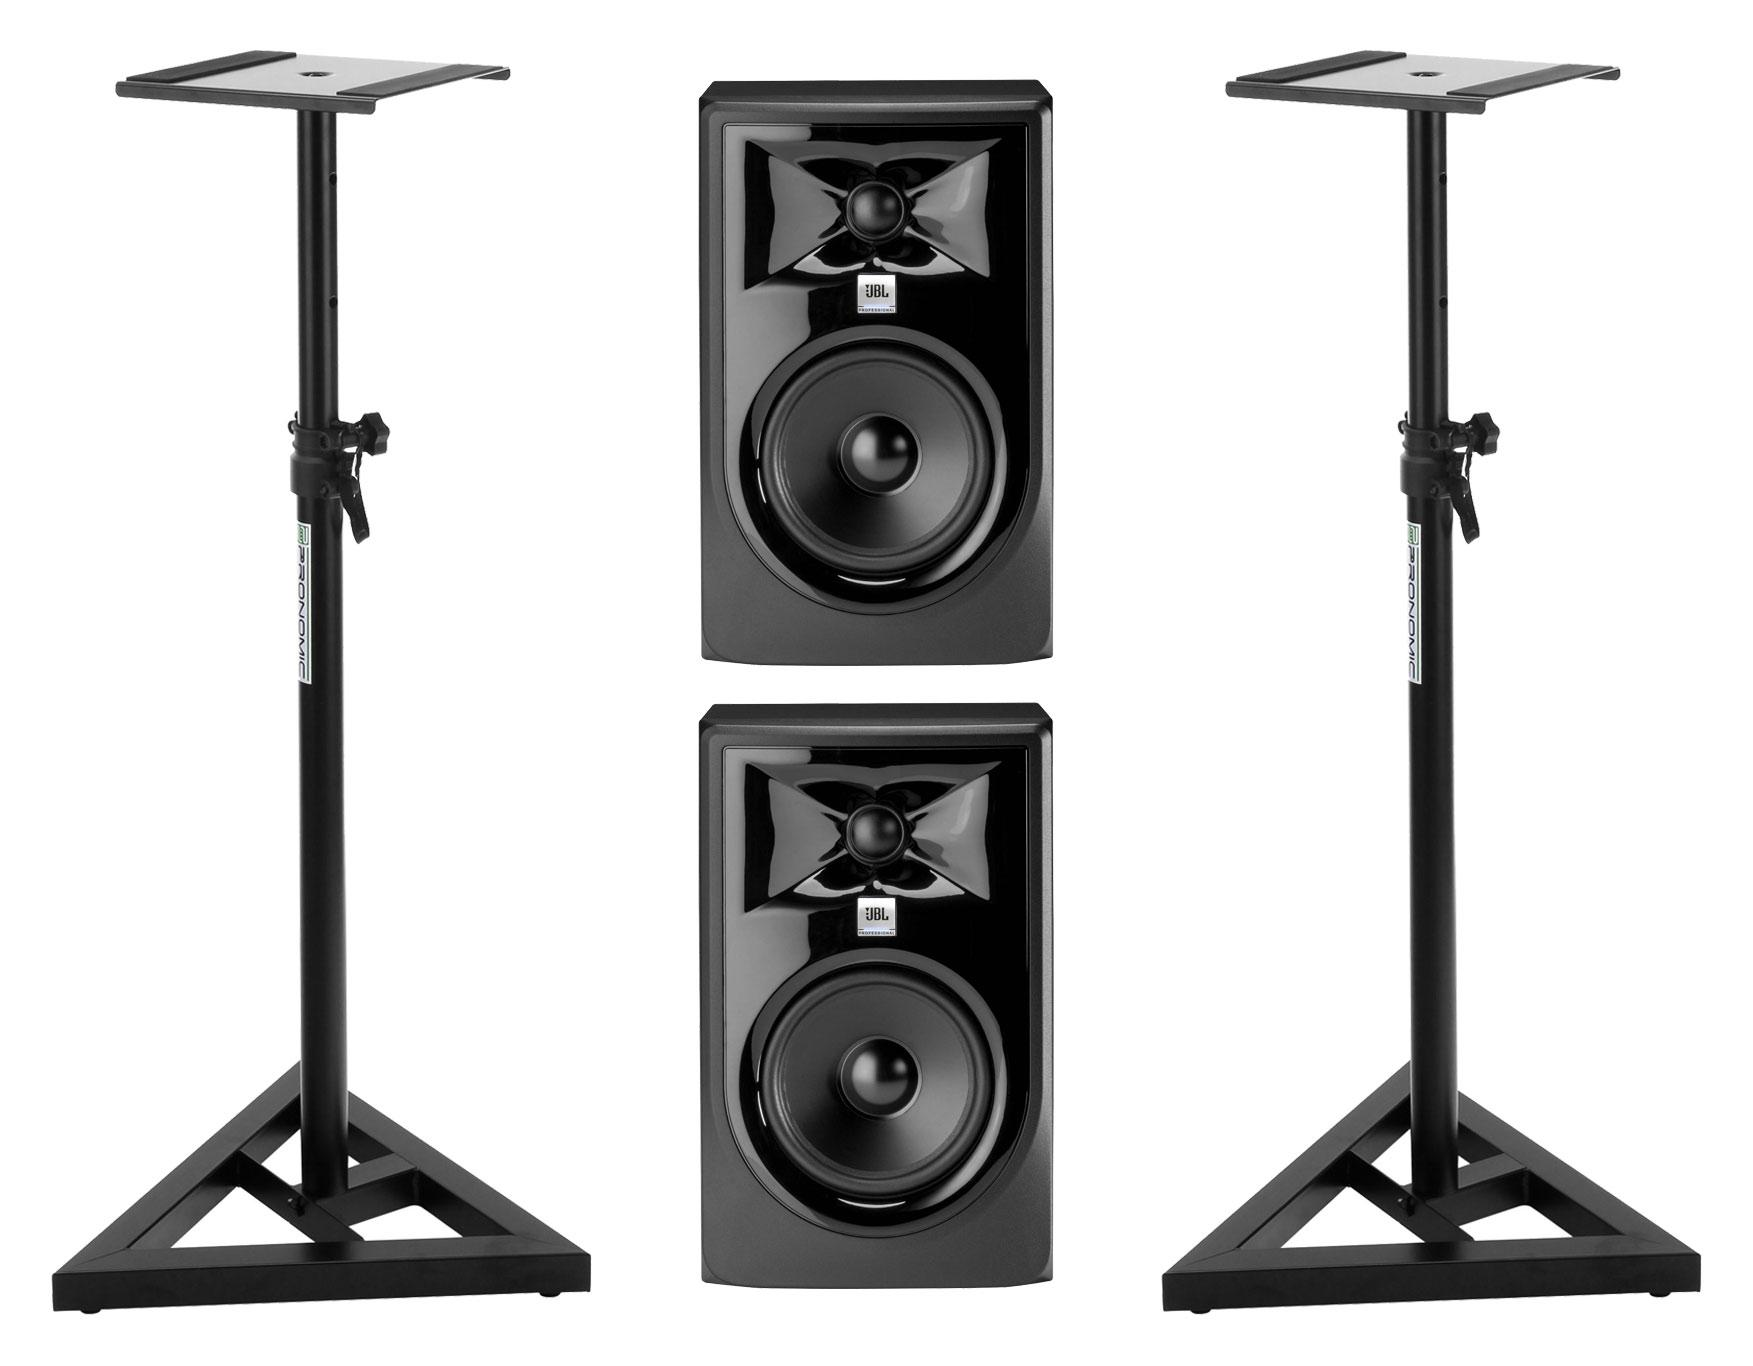 Studiomonitore - JBL 305P MKII Aktiv Studiomonitor Stativ Set - Onlineshop Musikhaus Kirstein